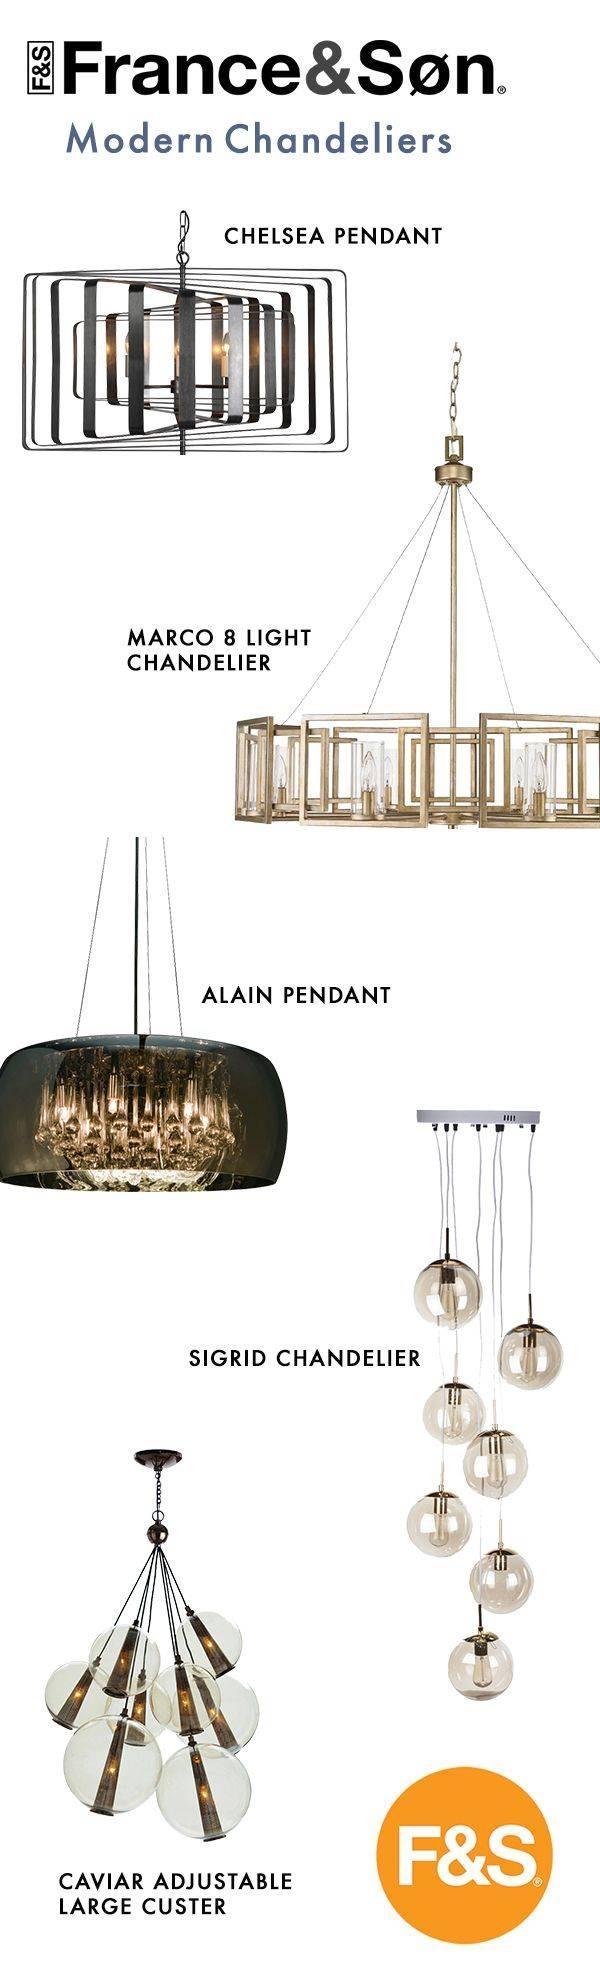 2071 Best The Light Fantastic Images On Pinterest   Home inside Caviar Lights Fixtures (Image 1 of 15)